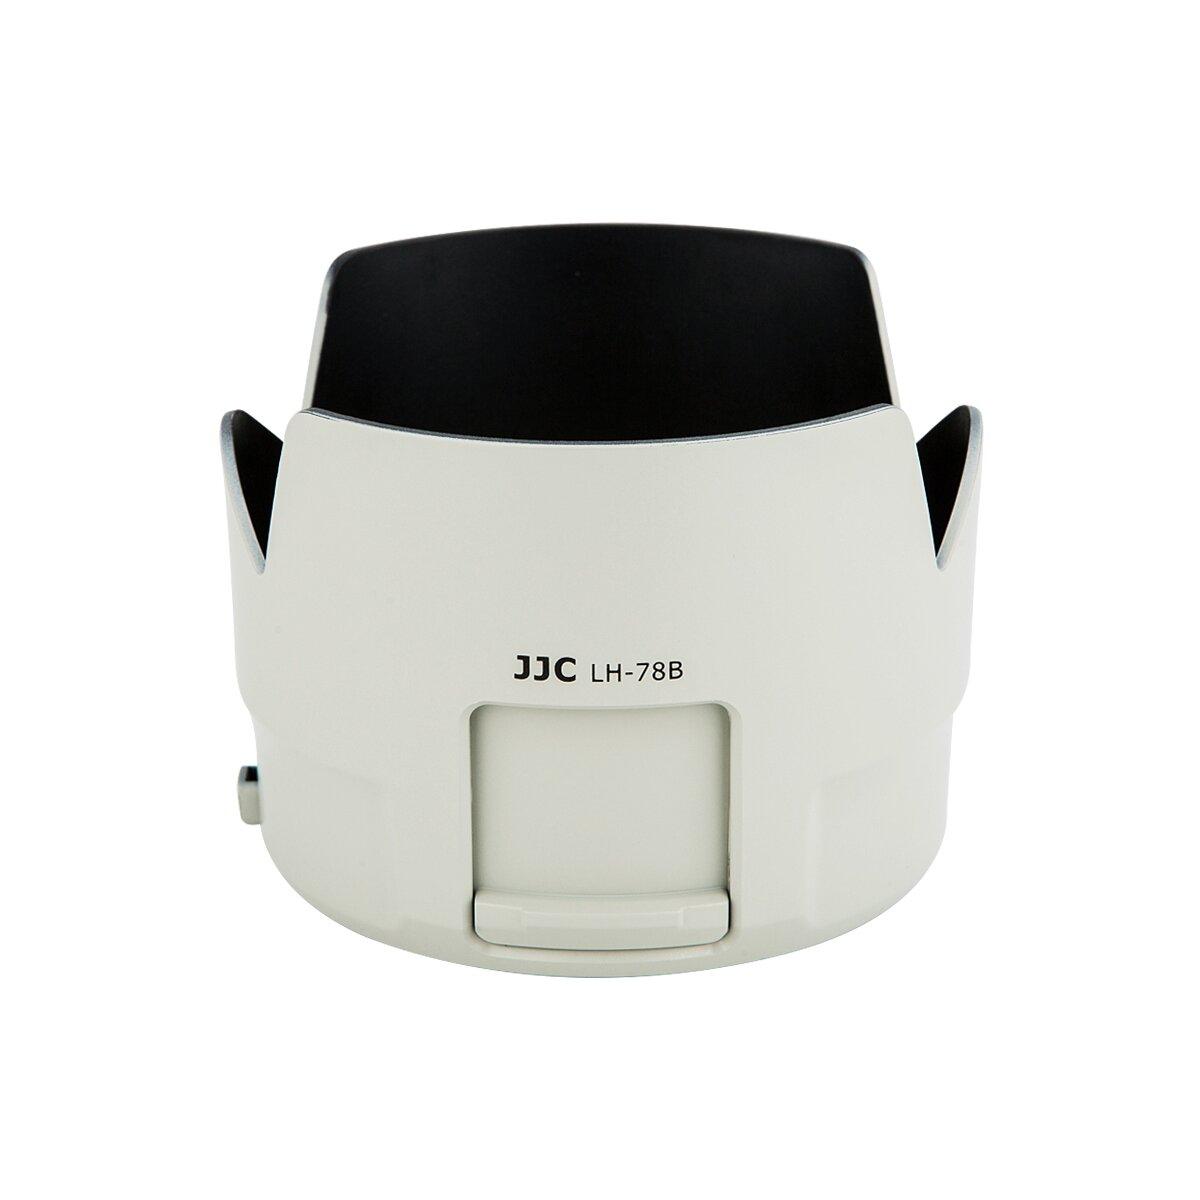 JJC LH-78B Sonnenblende Gegenlichtblende, Kompatibel mit Canon EF 70-200mm f/4L IS II USM Objektiv